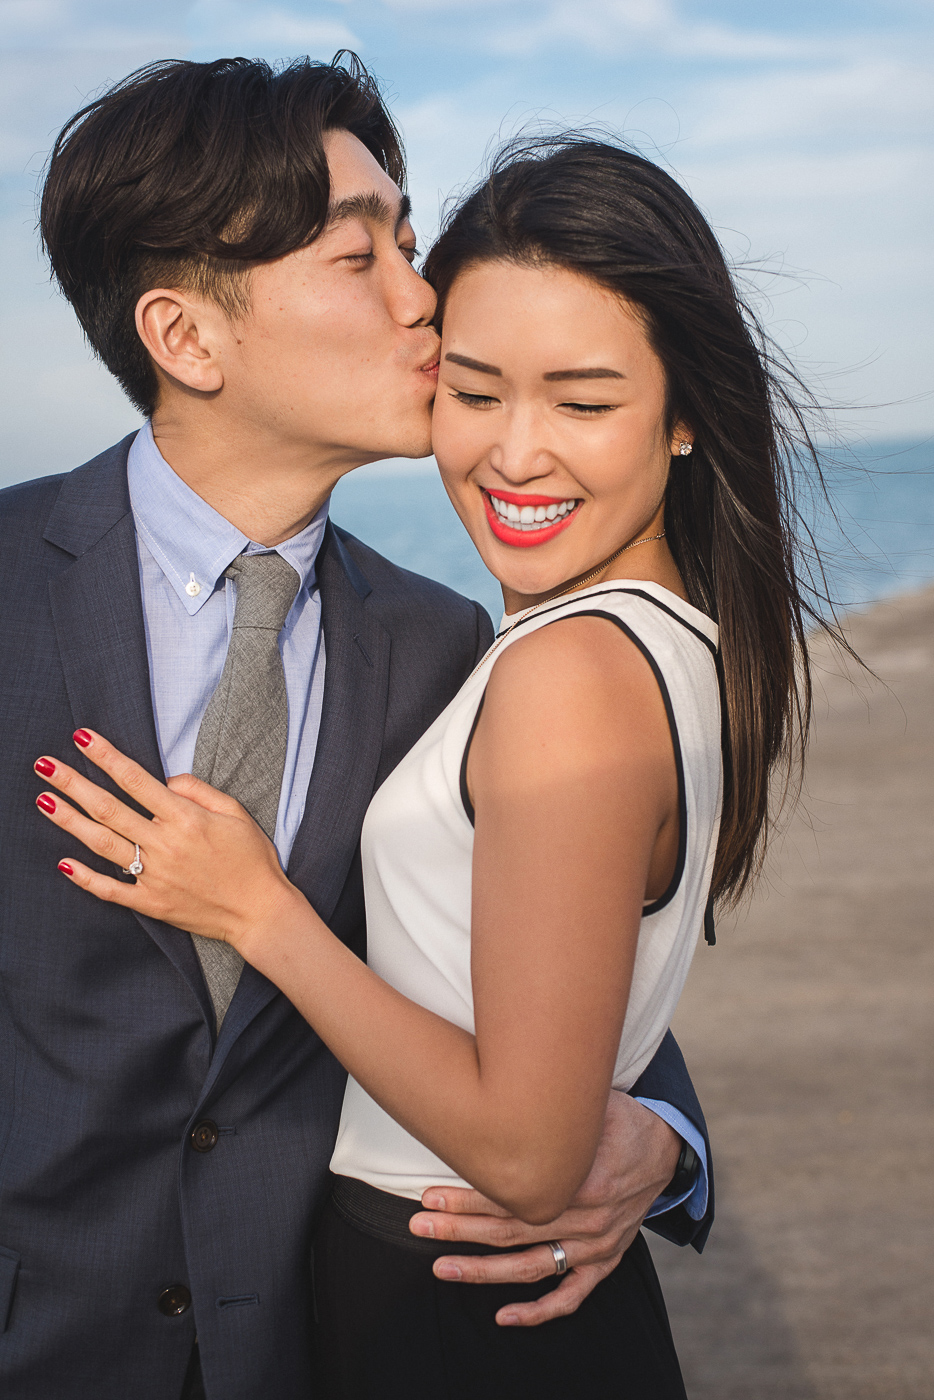 Zoe_Rain_Chicago_Engagement_Shoot_Wedding_Photography_Couple_-12.jpg